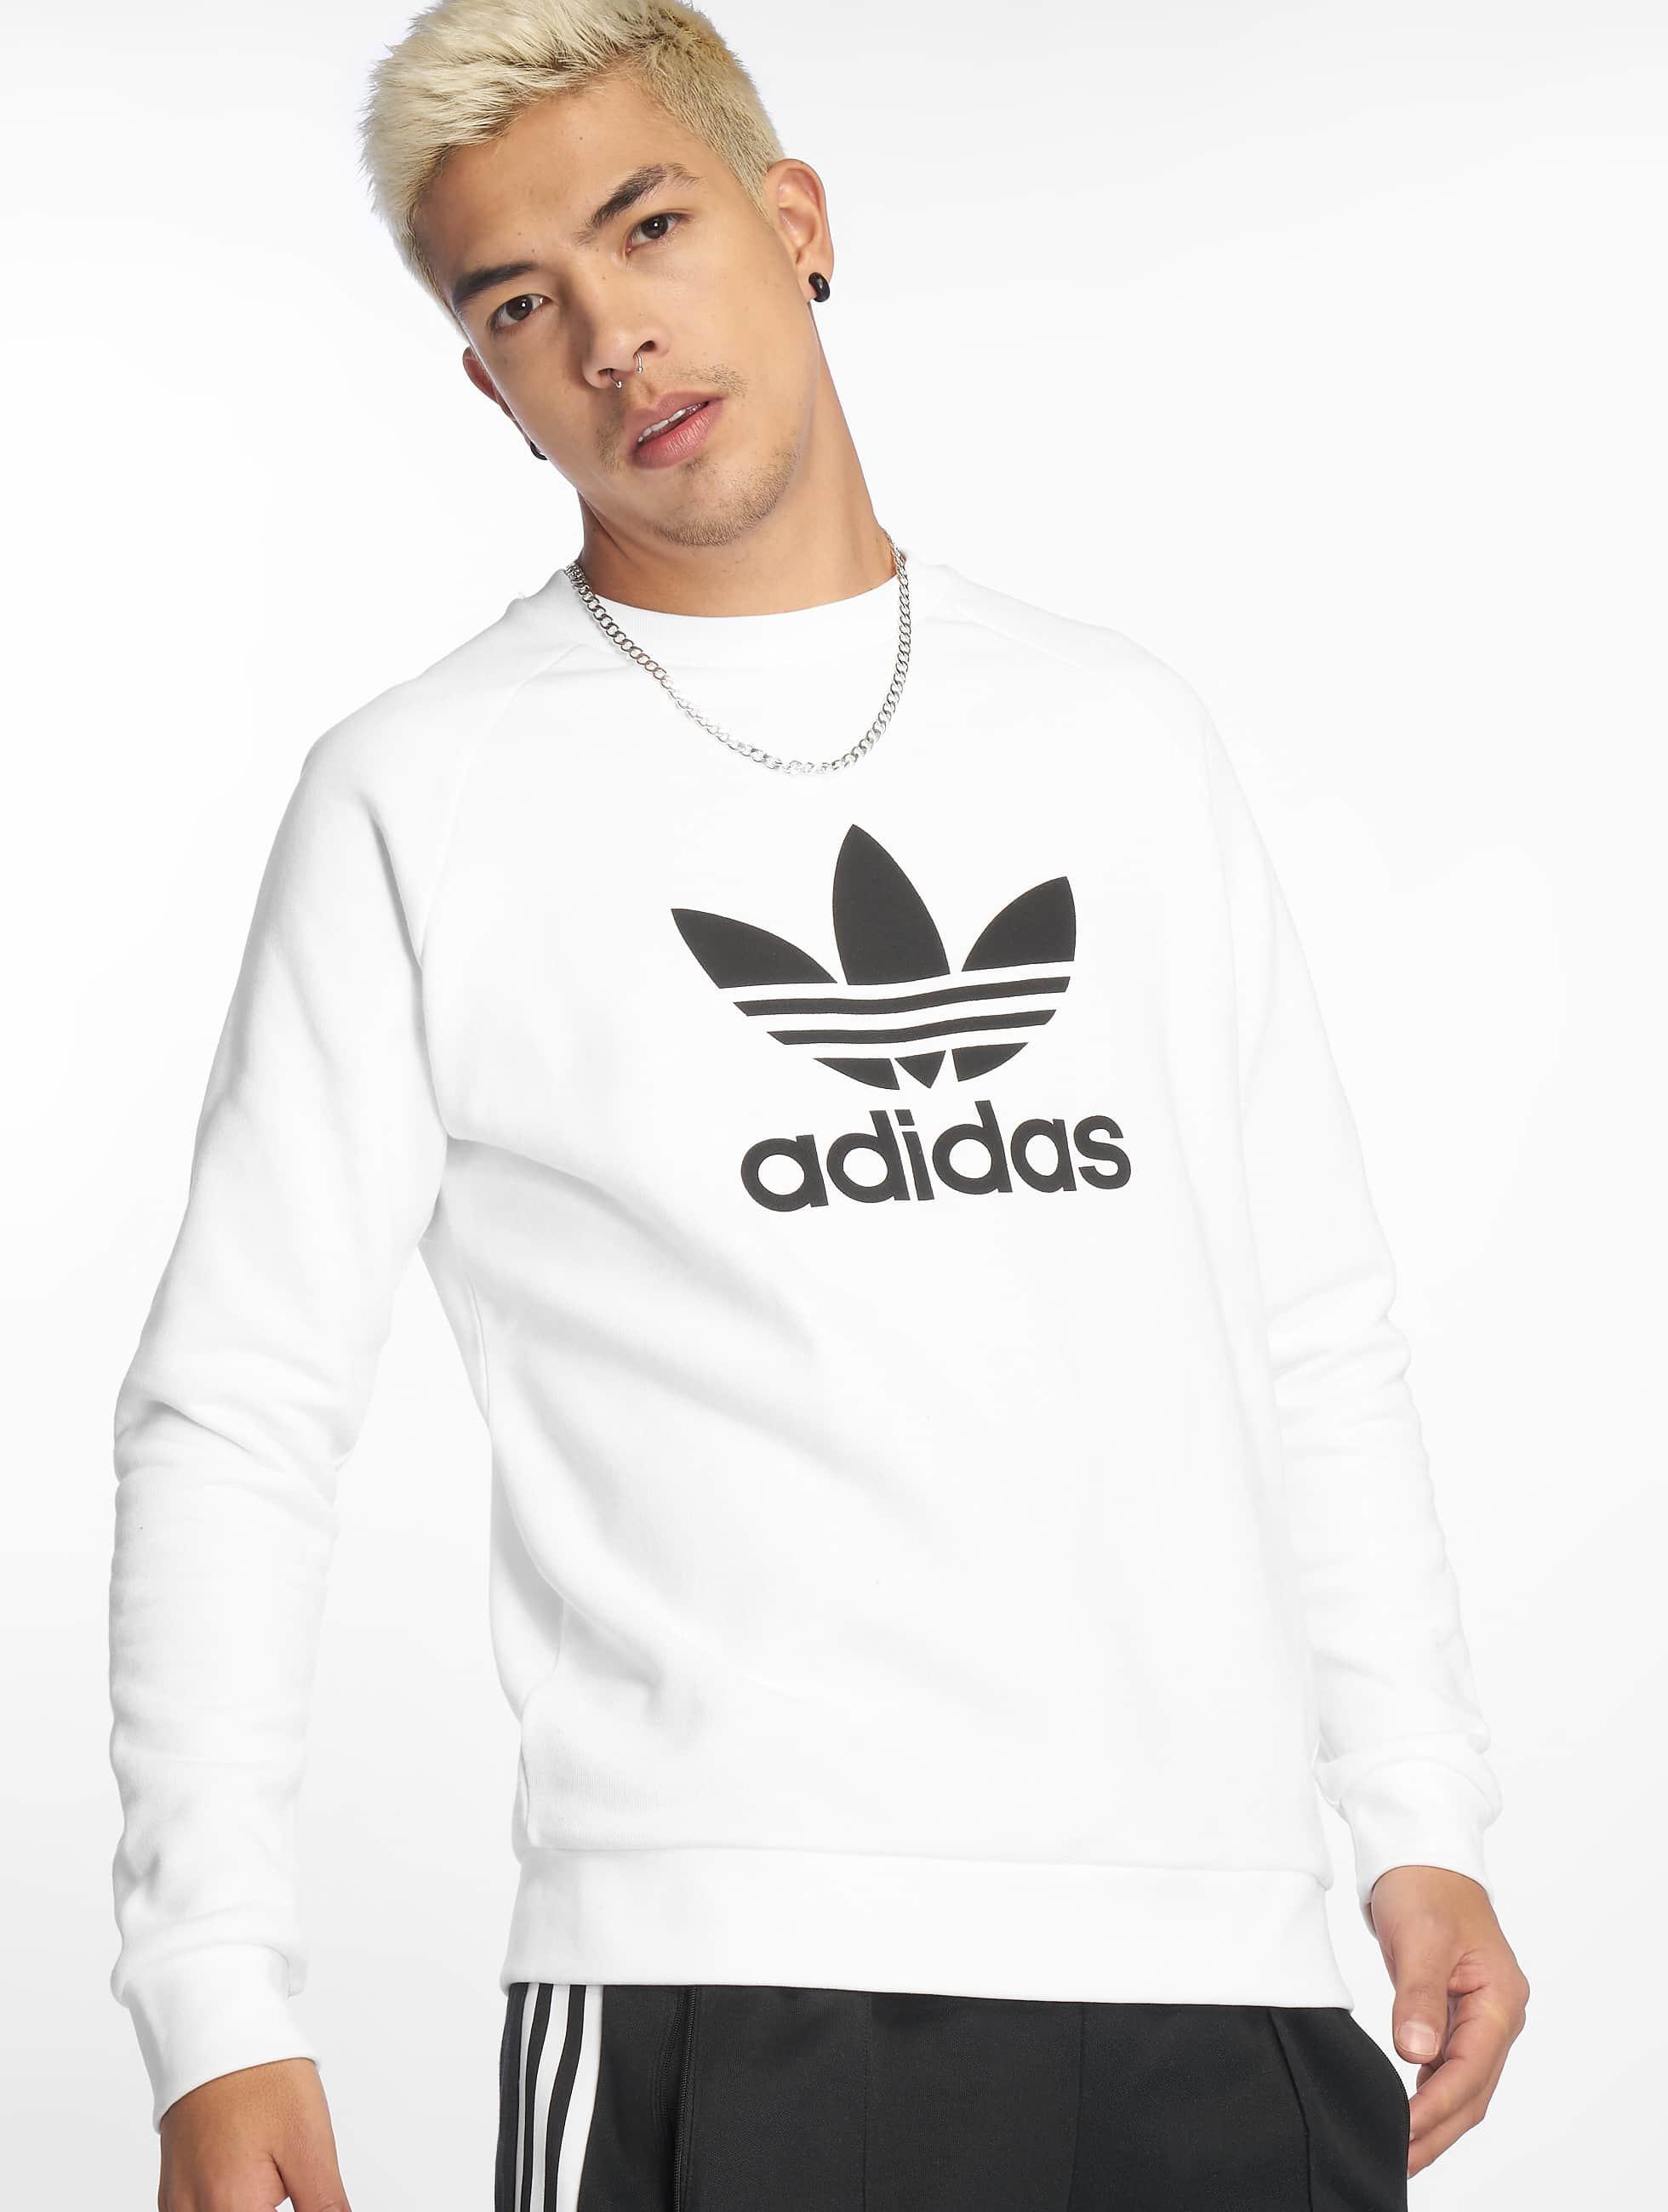 Adidas Originals Trefoil Sweatshirt White